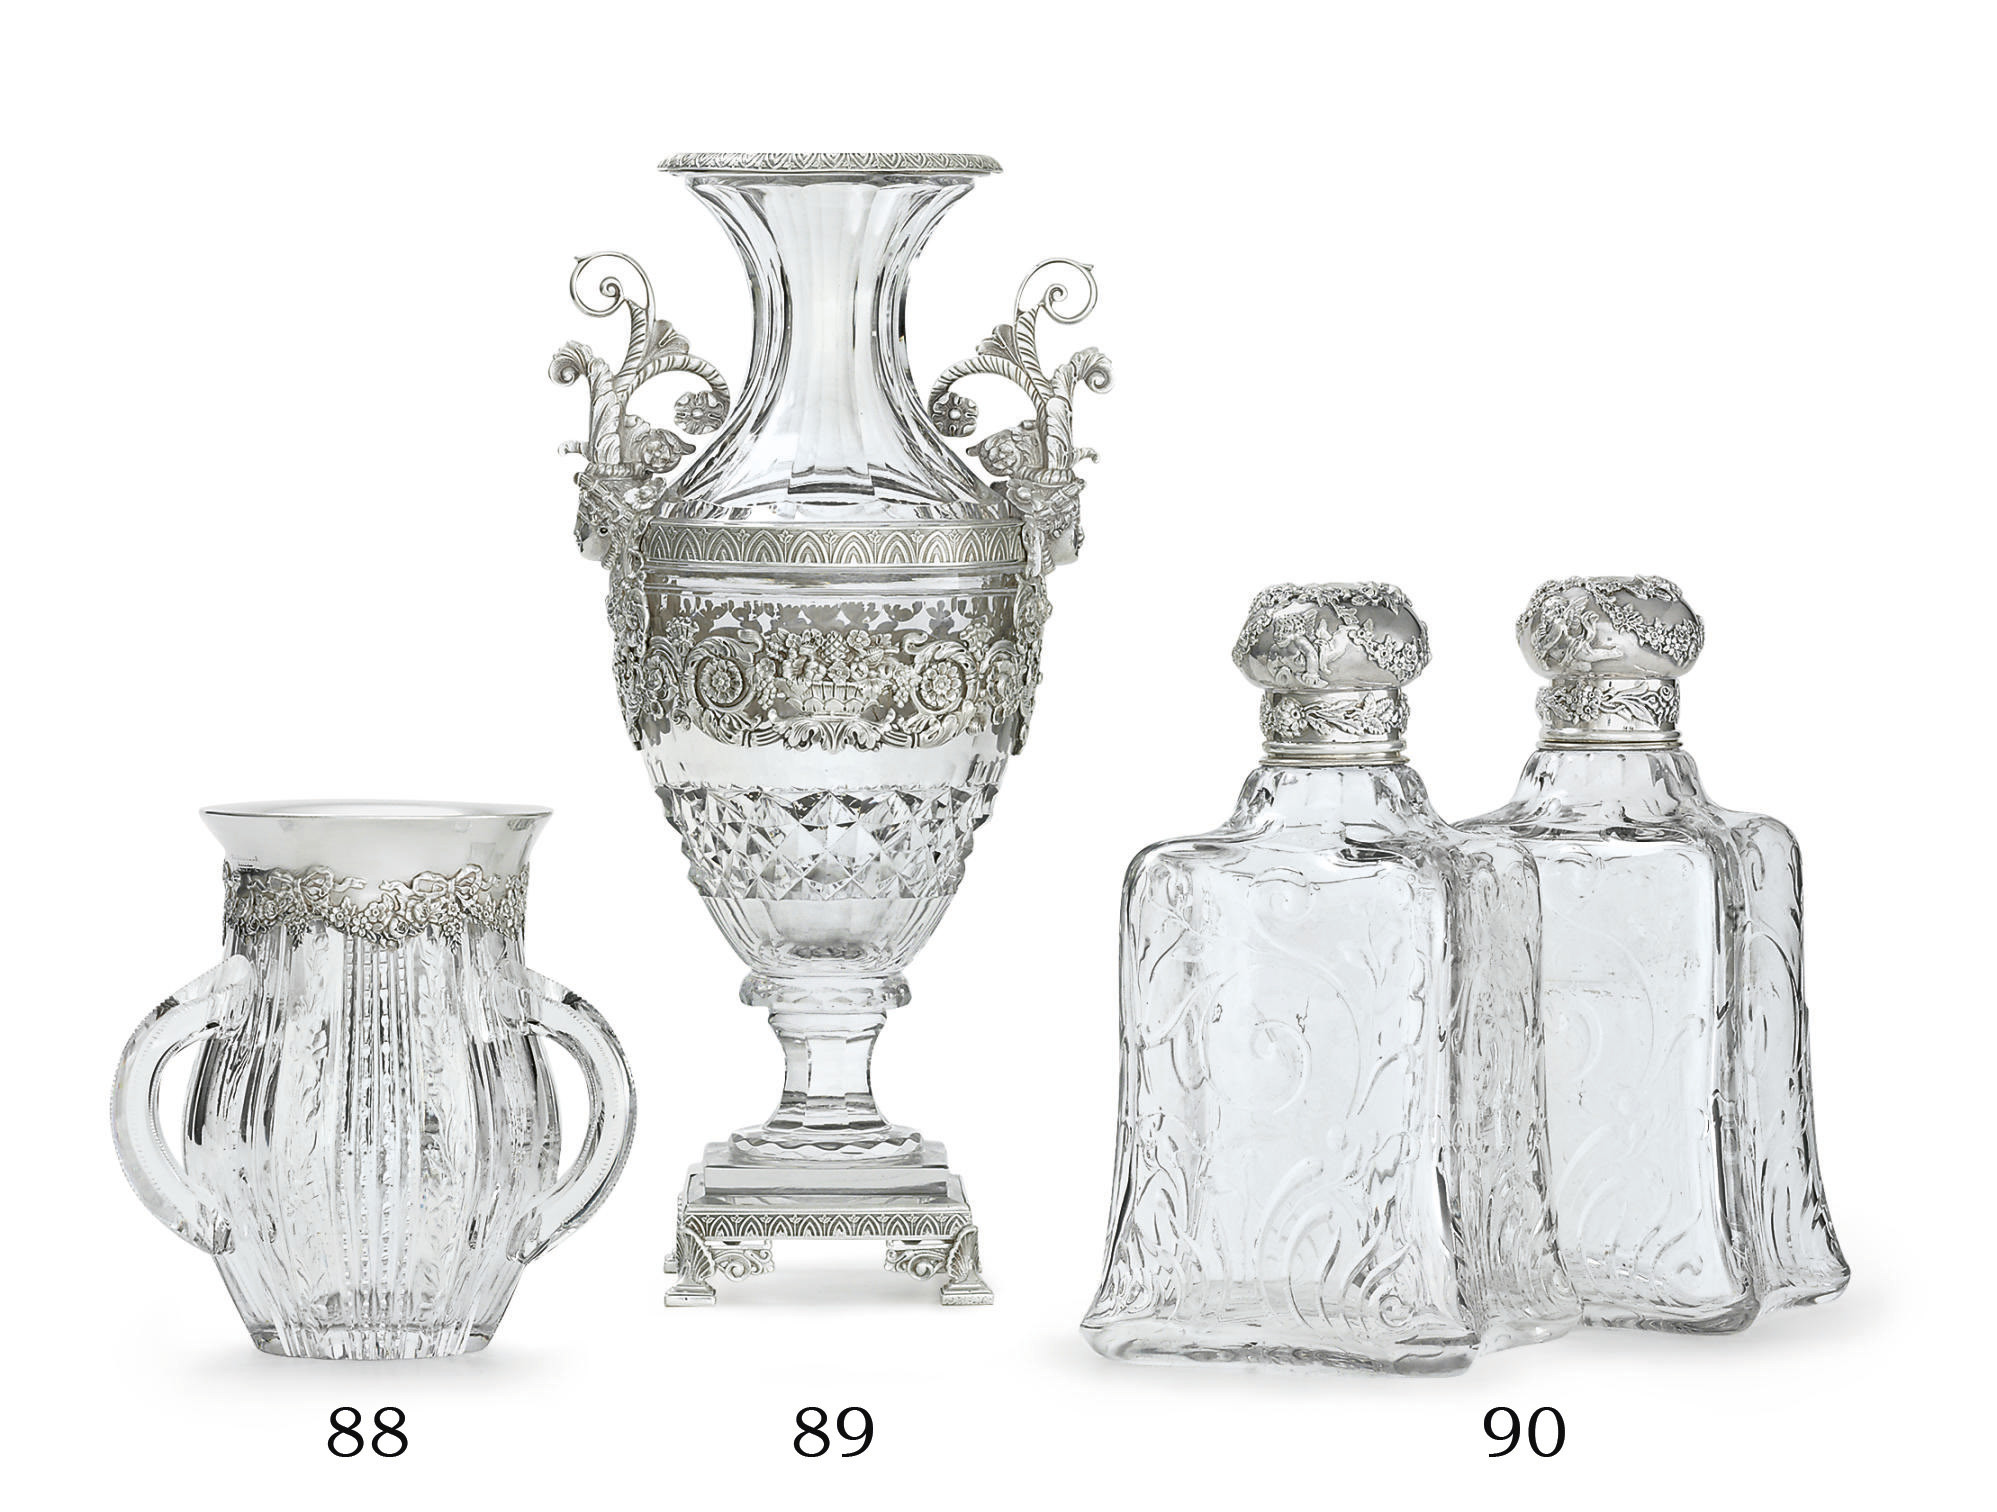 A SILVER-MOUNTED CUT-GLASS VAS